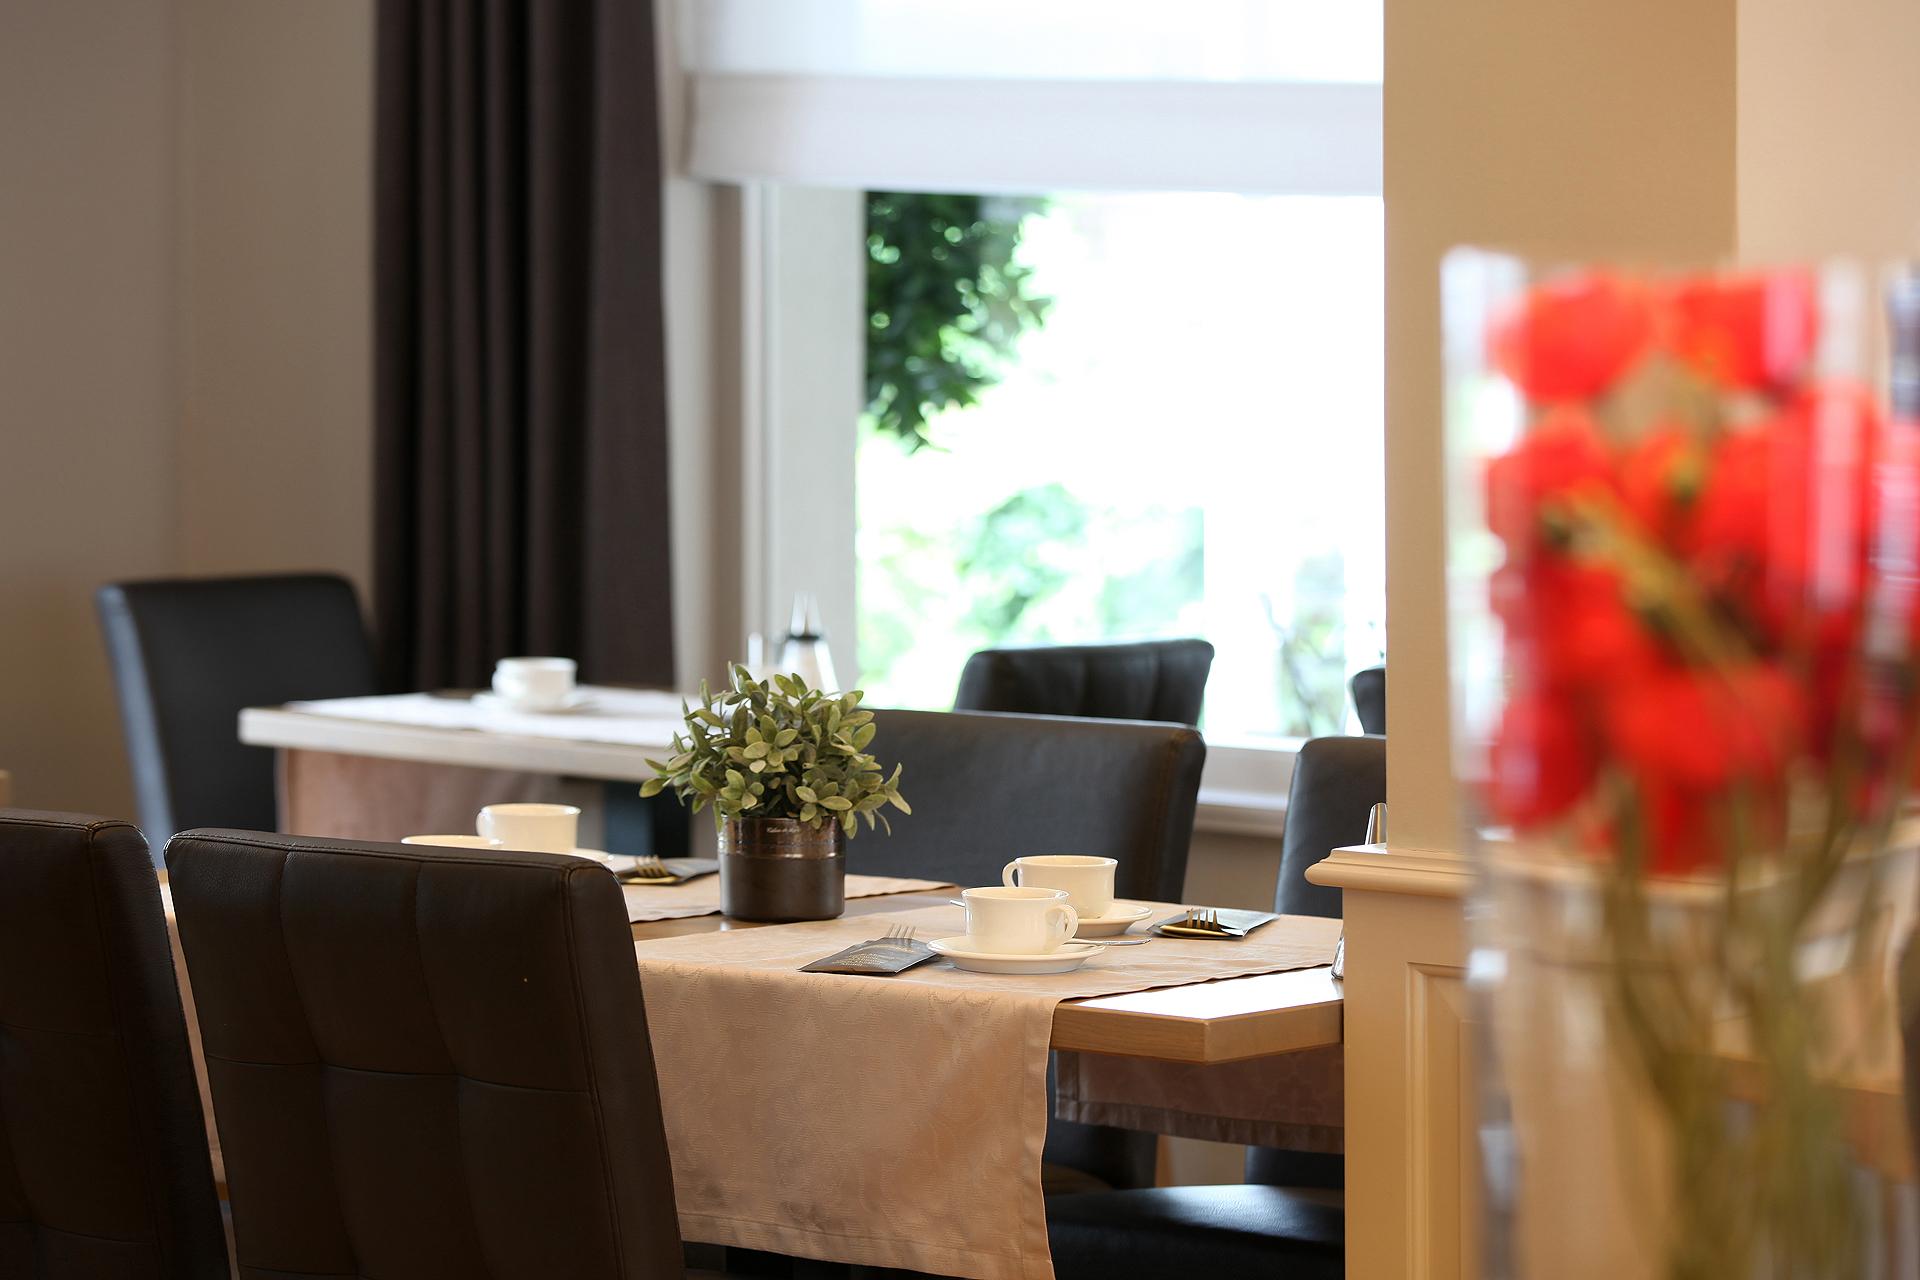 restaurant hotel ambassador de panne kust